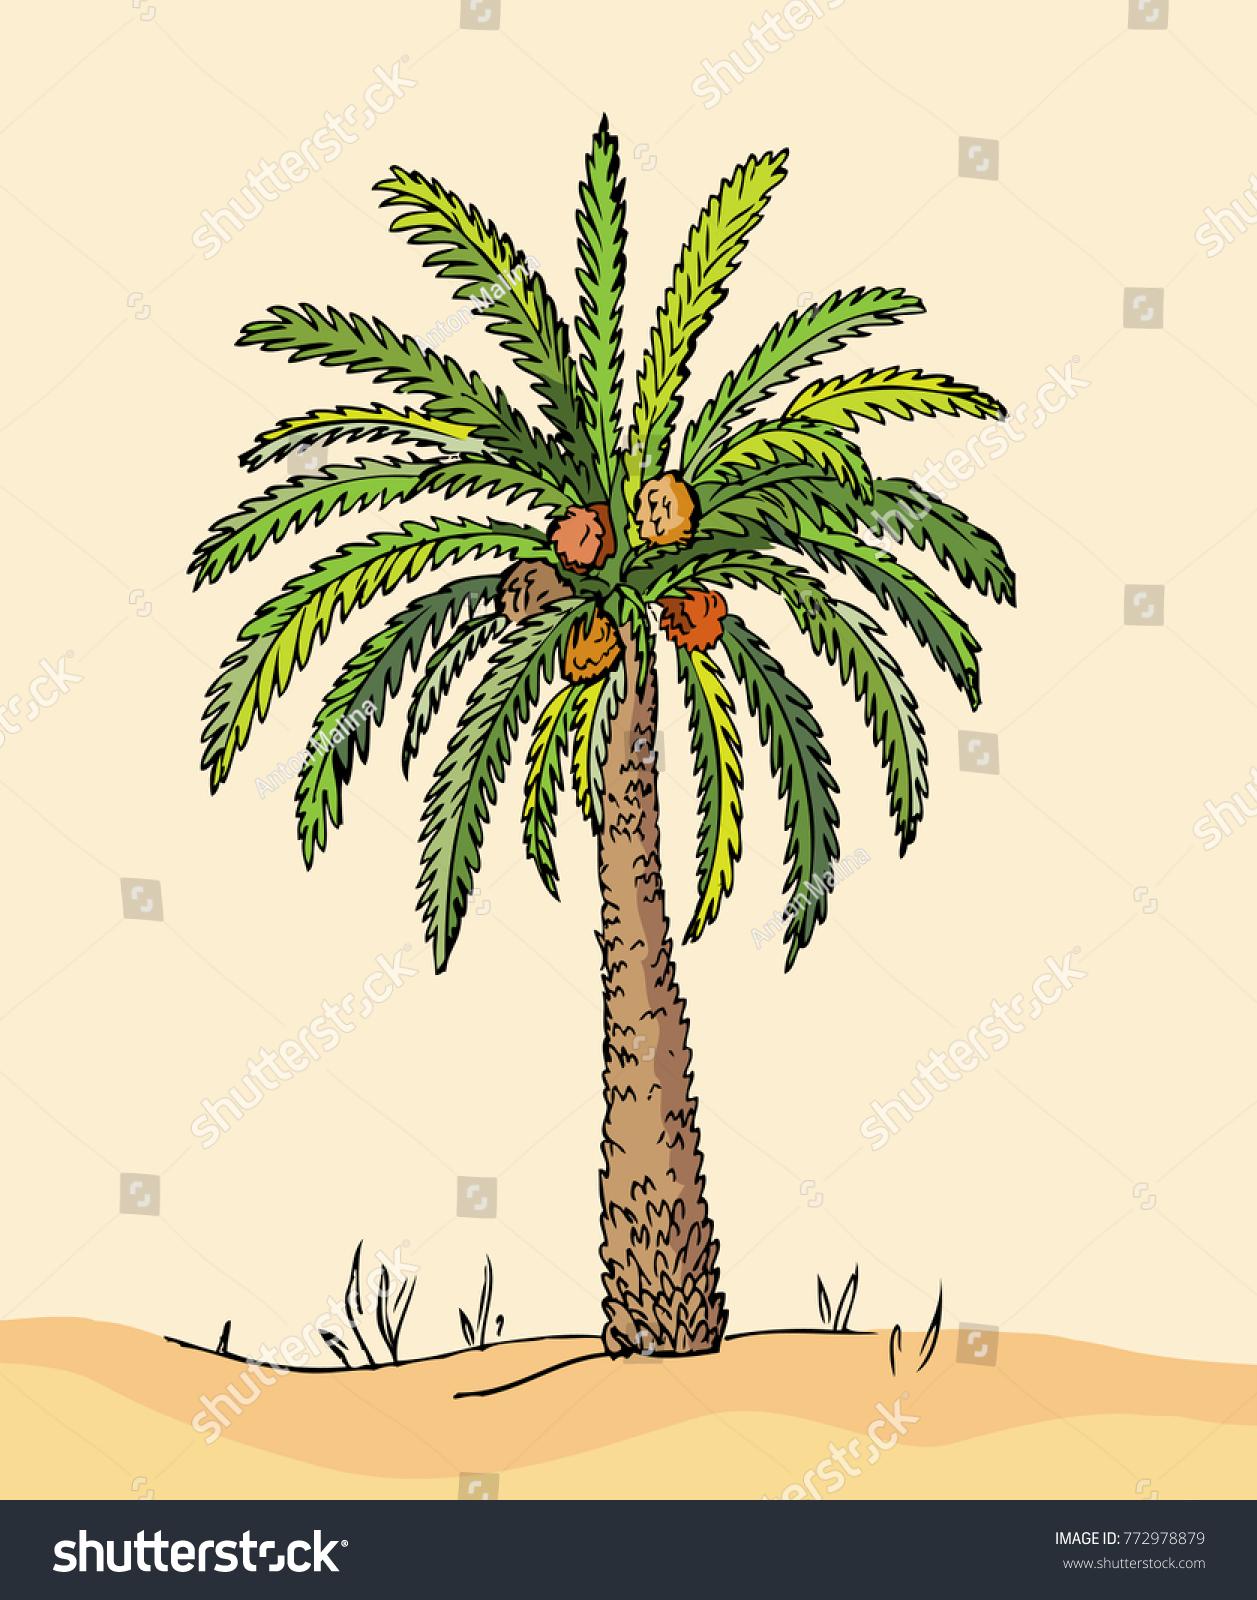 Desert date fruit palm on sand stock vector 772978879 shutterstock desert date fruit palm on sand dunes vector hand drawn palm tree sketch biocorpaavc